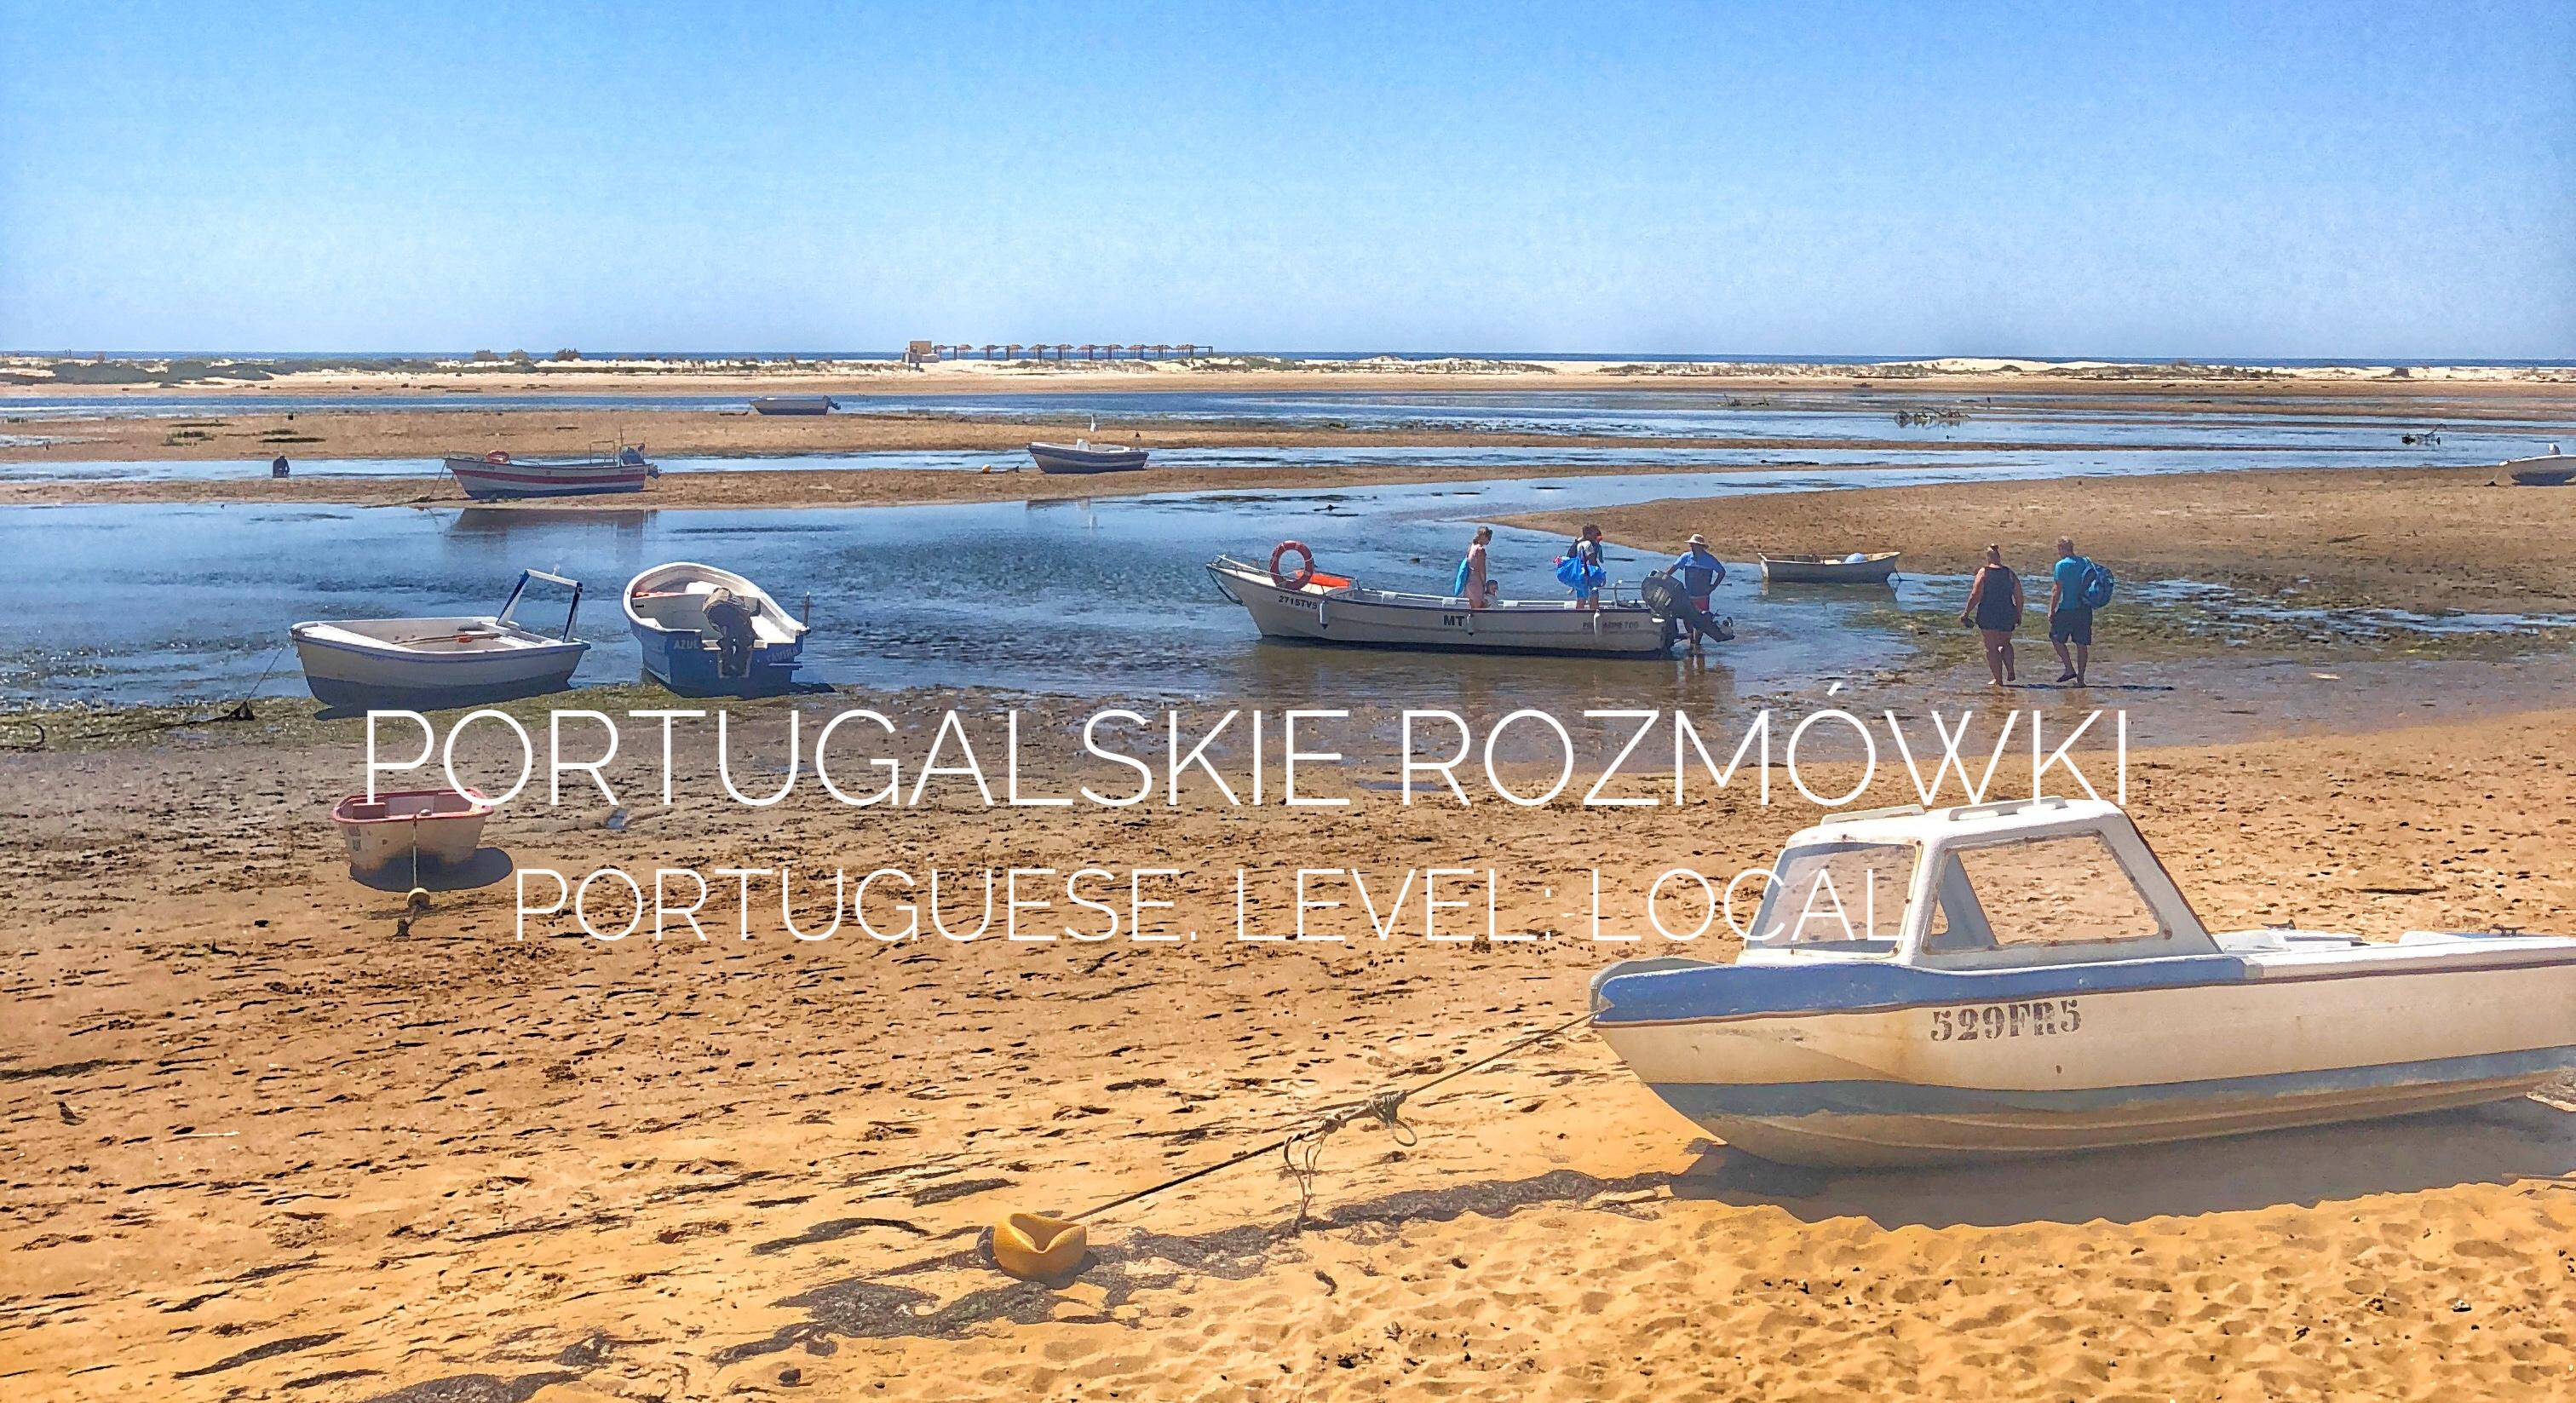 Portugalskie rozmówki – Portuguese level: local – Tanto me faz